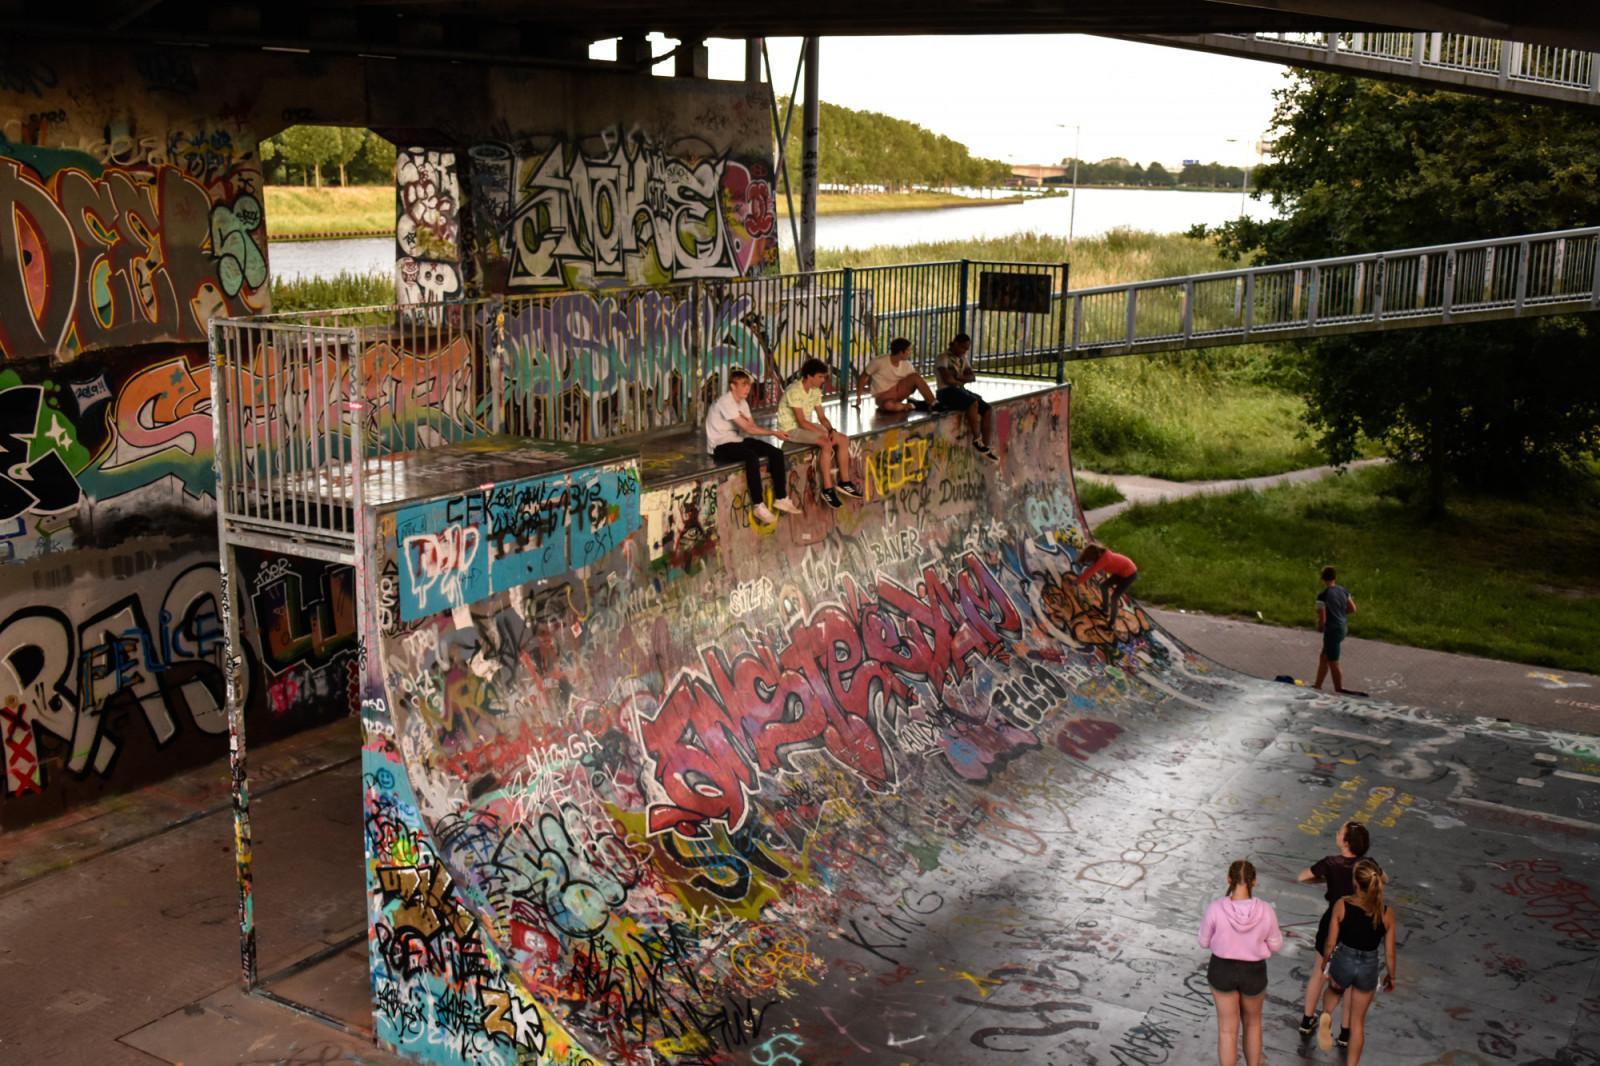 Skat ramp with graffiti in Amsterdam